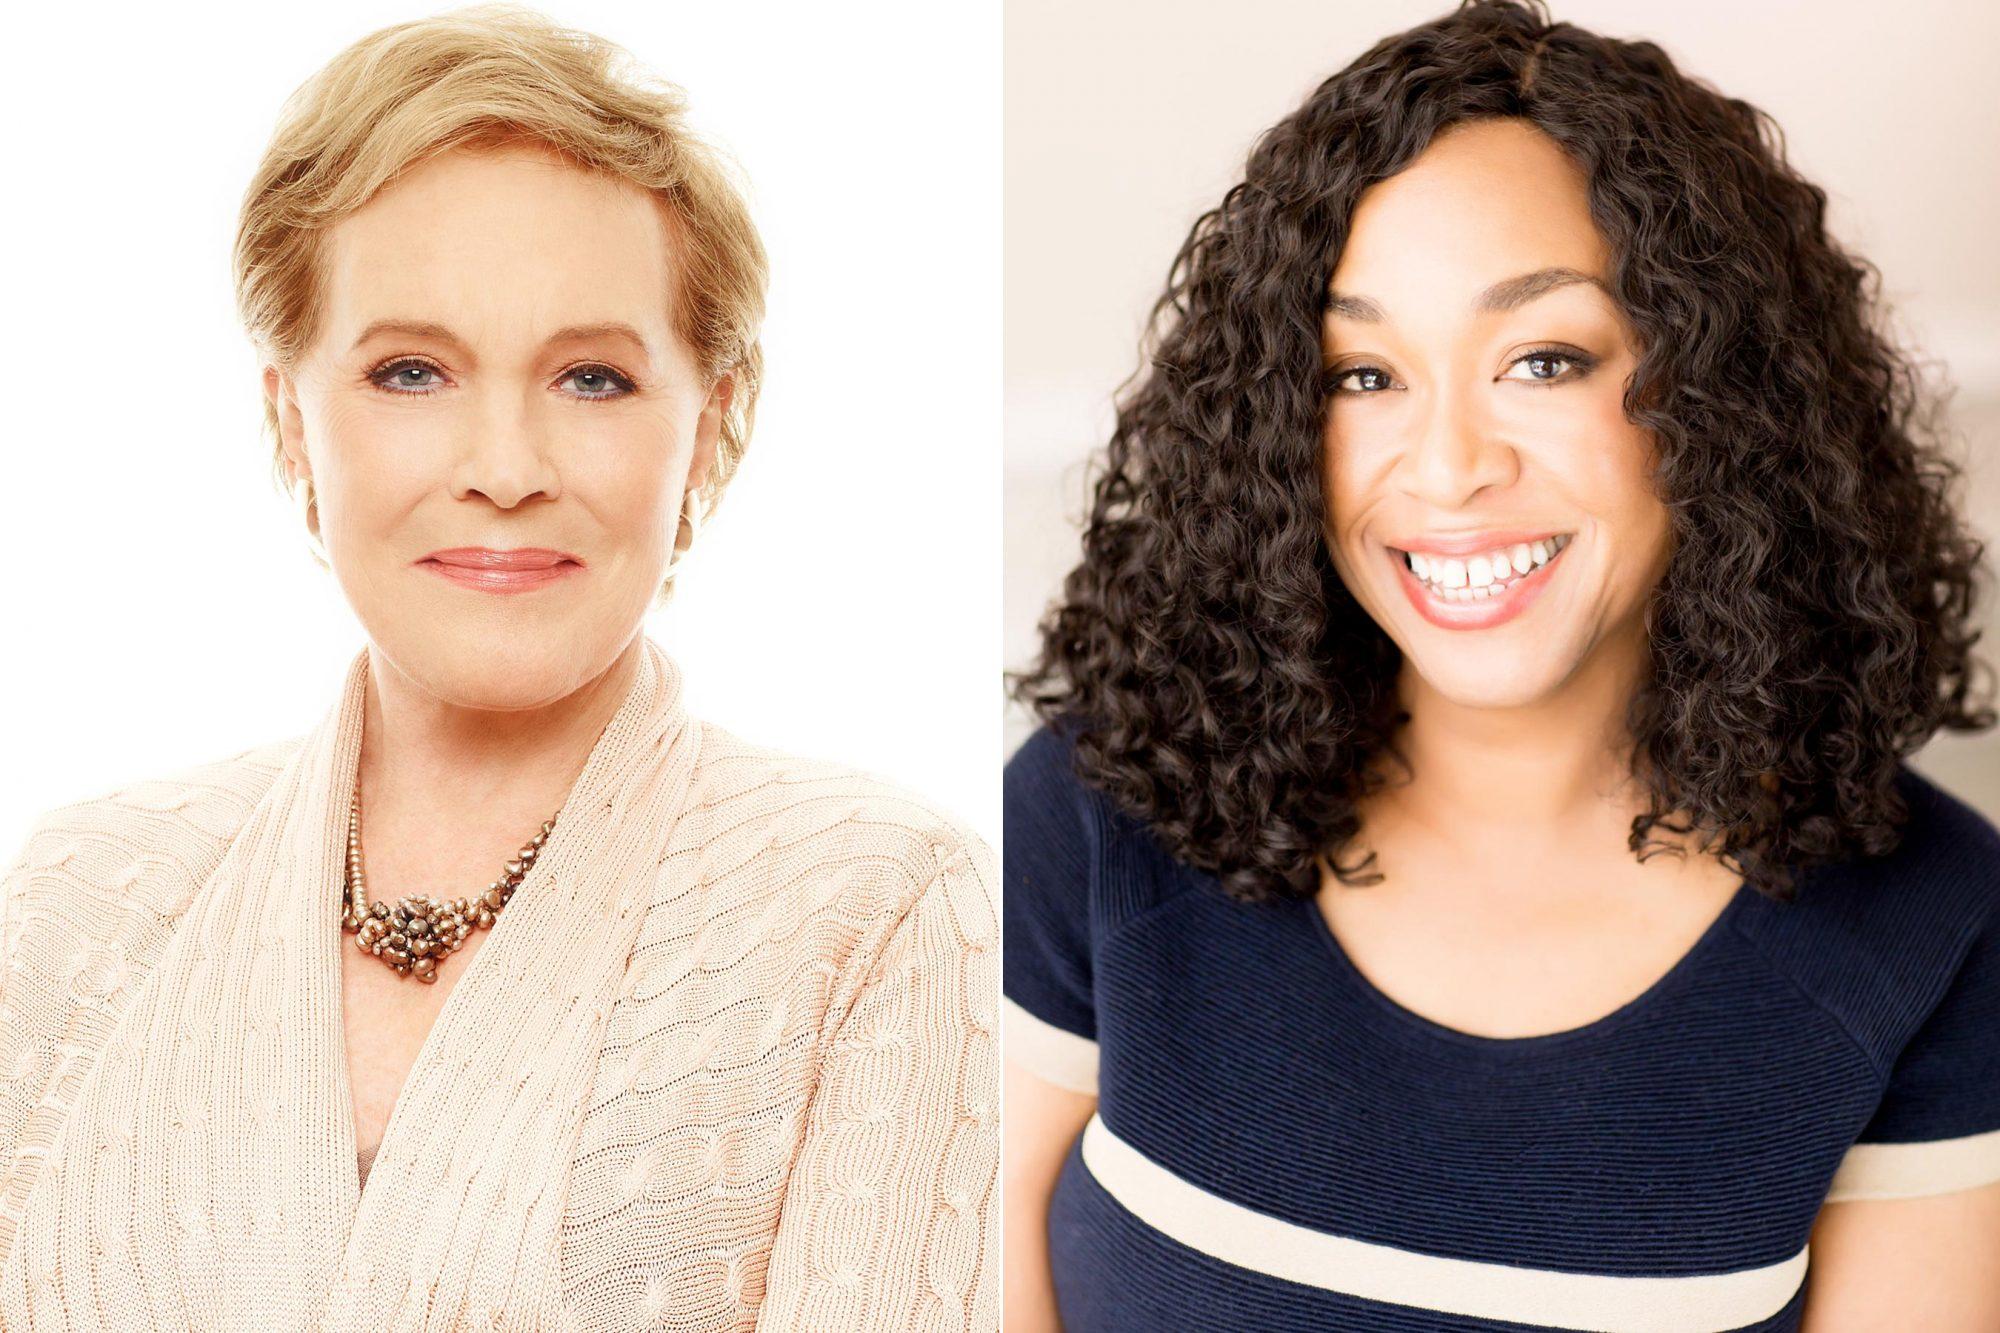 Julie Andrews cast in Shonda Rhimes' Bridgerton Netflix series